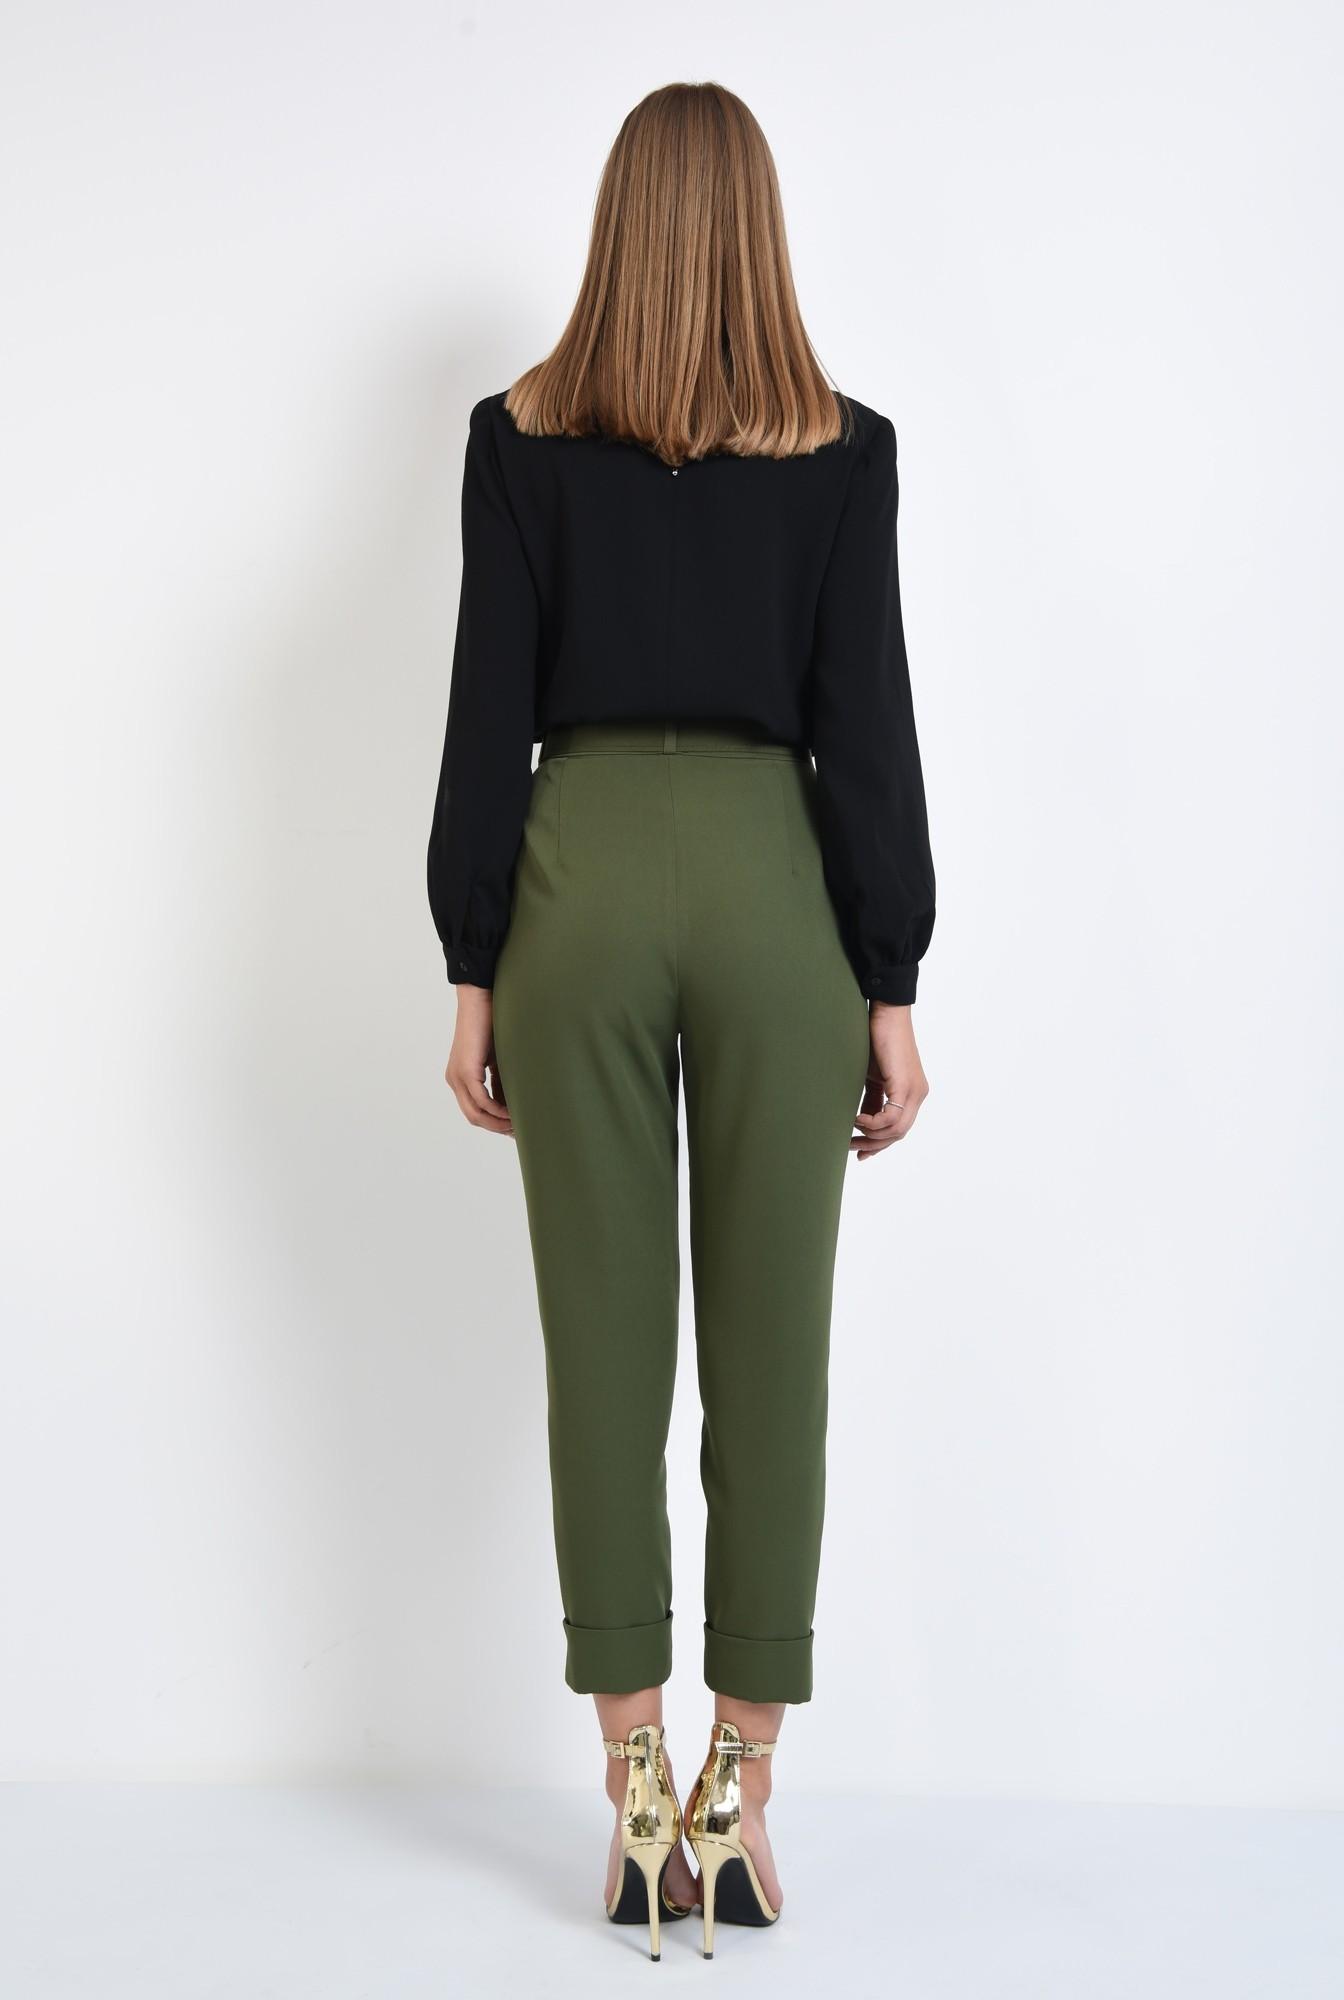 1 - pantaloni de dama, pantaloni online, verde kaki, curea, mansete